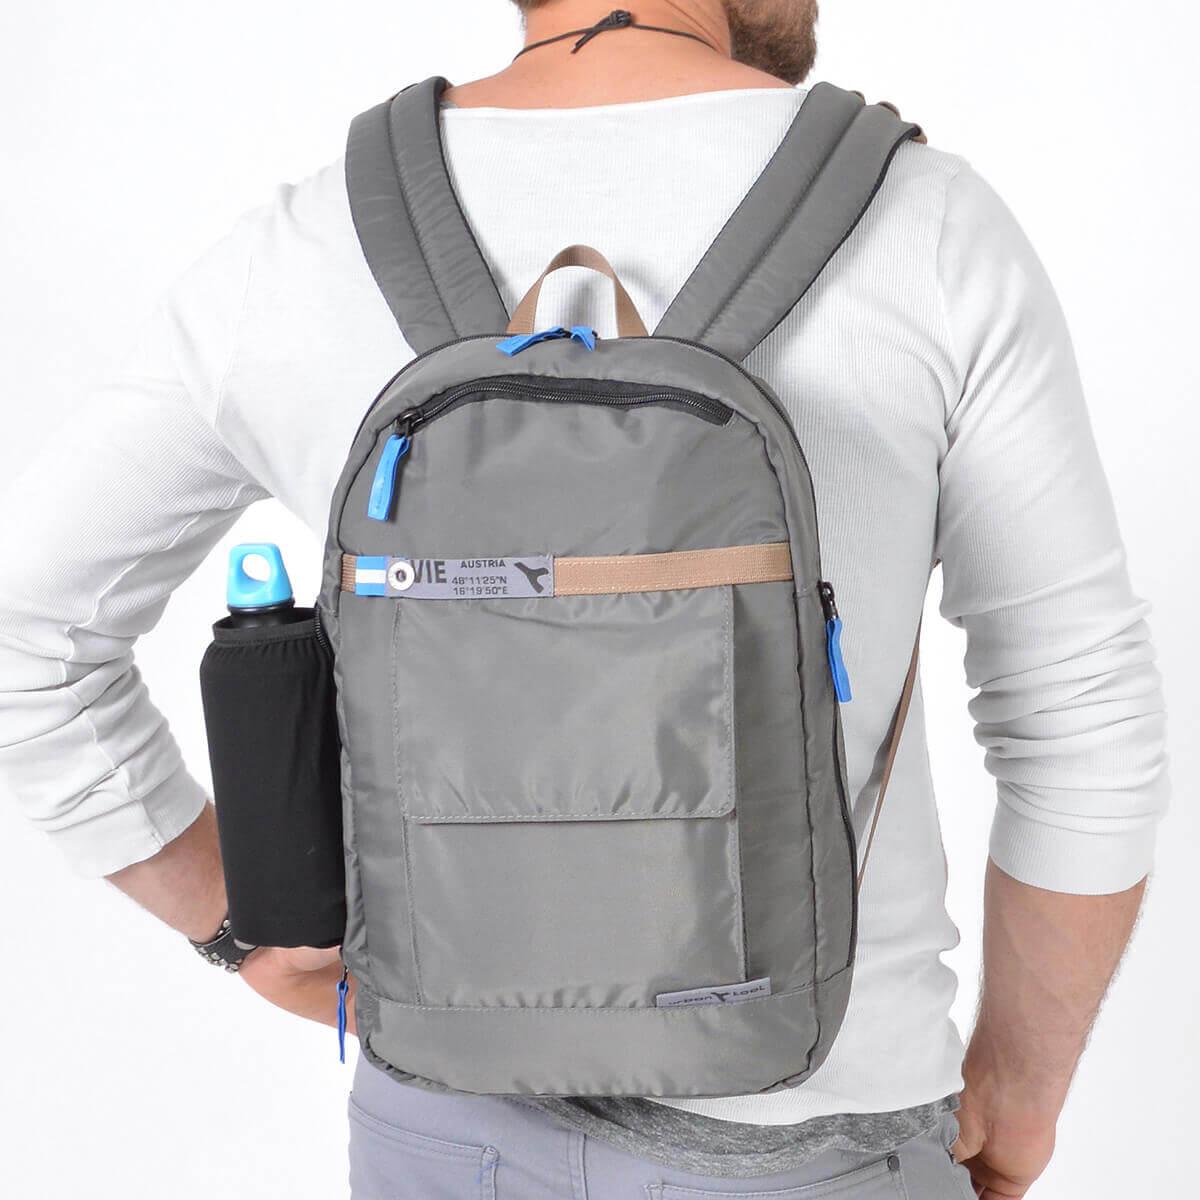 Lightweight travel backpack men & women URBAN TOOL ® travel backpack